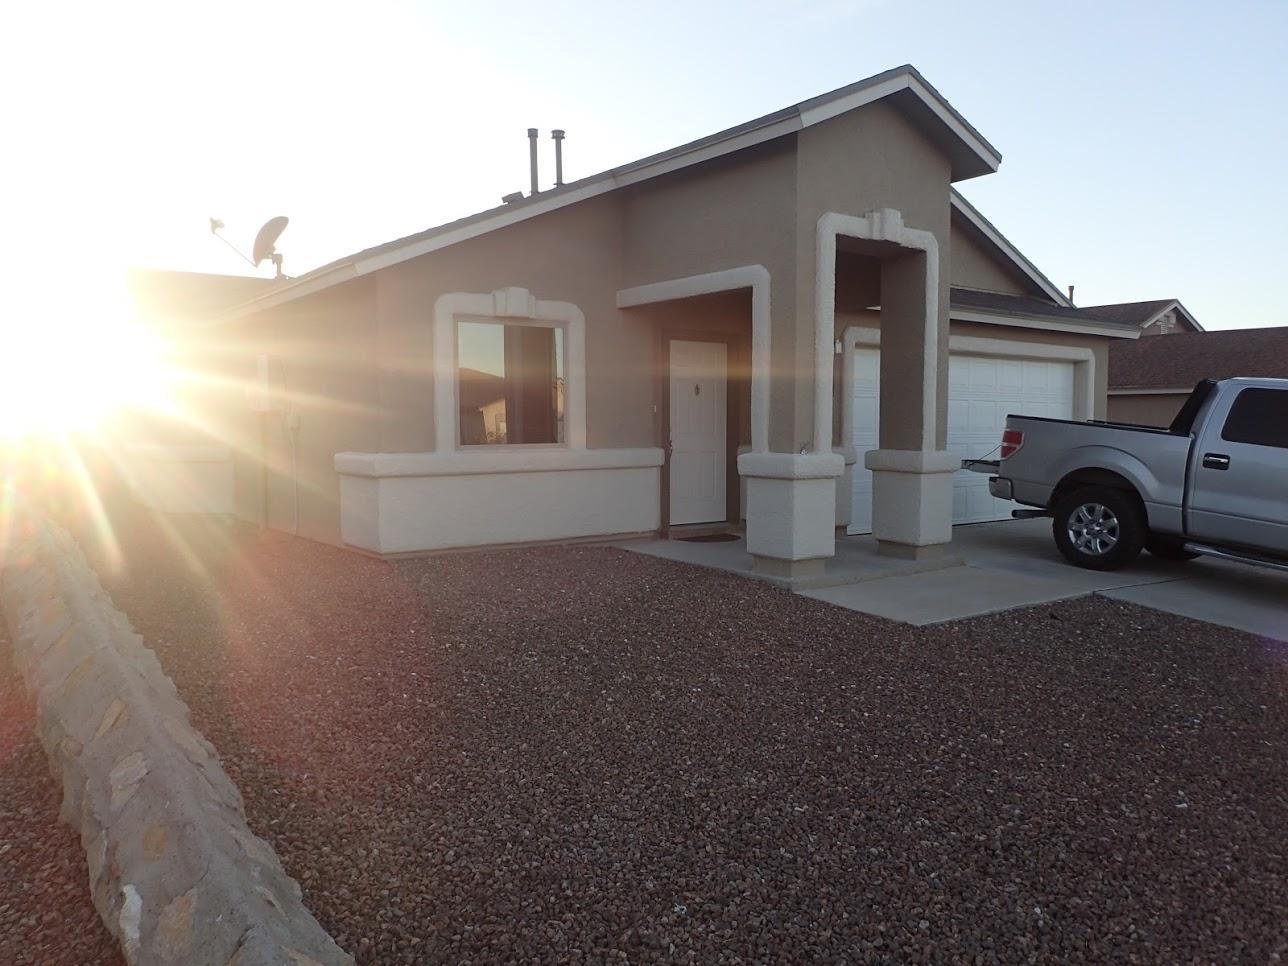 171 HORIZON POINT, El Paso, Texas 79928, 3 Bedrooms Bedrooms, ,2 BathroomsBathrooms,Residential Rental,For Rent,HORIZON POINT,819227